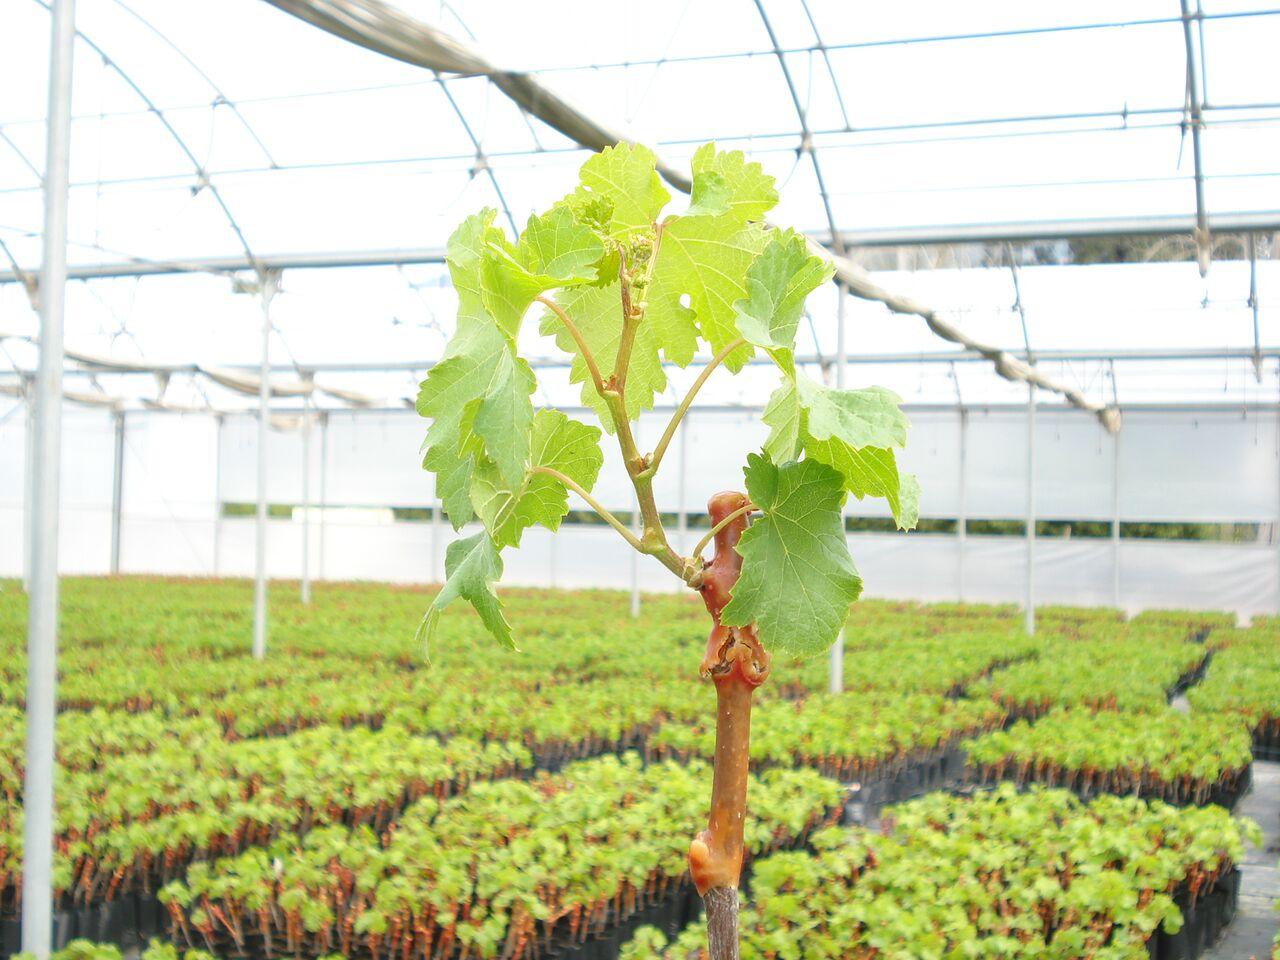 Viveros apoyan agricultores frente al Código de Aguas